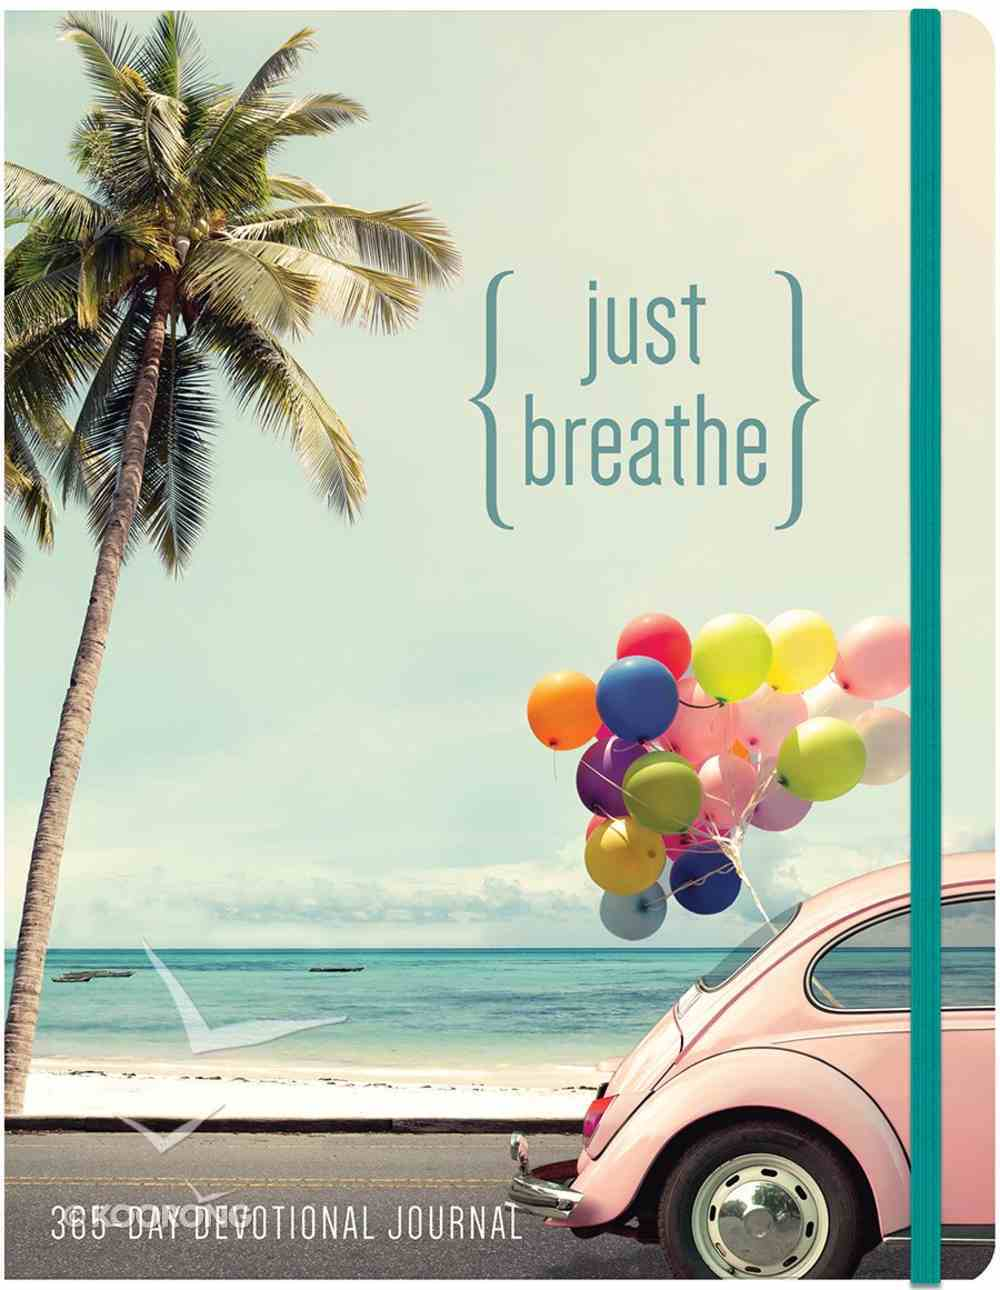 Devotional Journal: Just Breathe Paperback